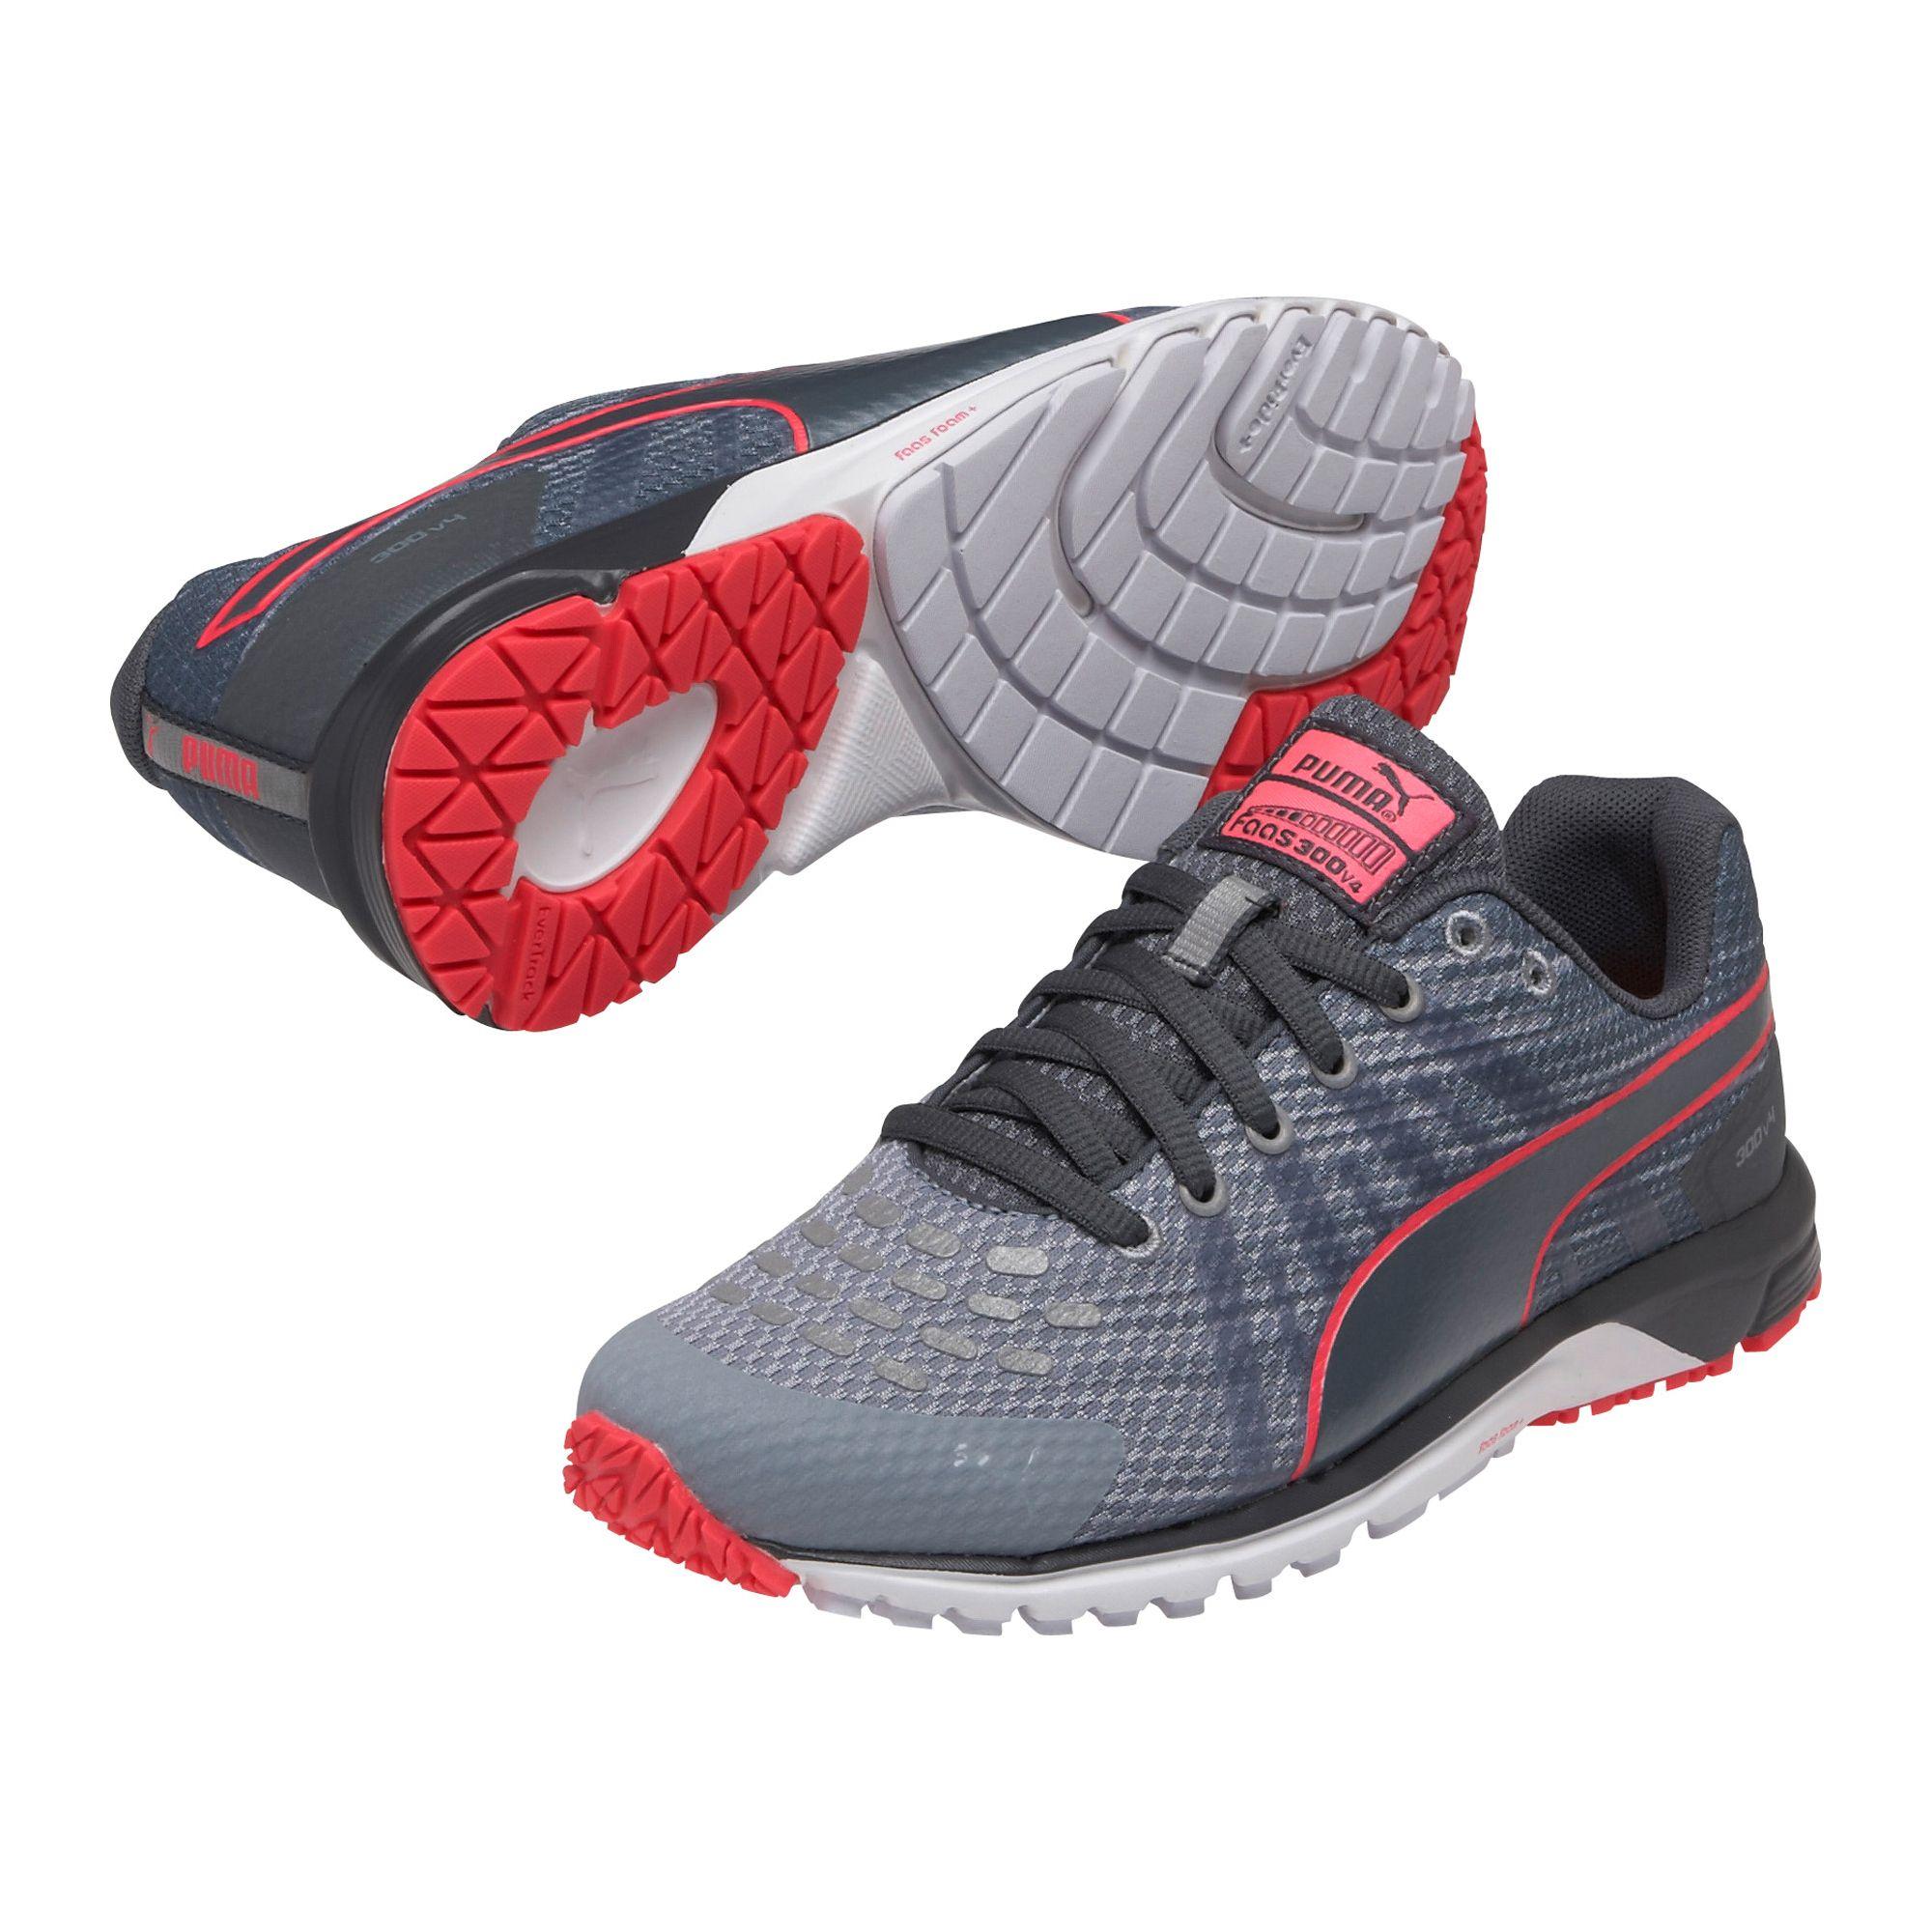 Puma Faas  V Ladies Running Shoes Review